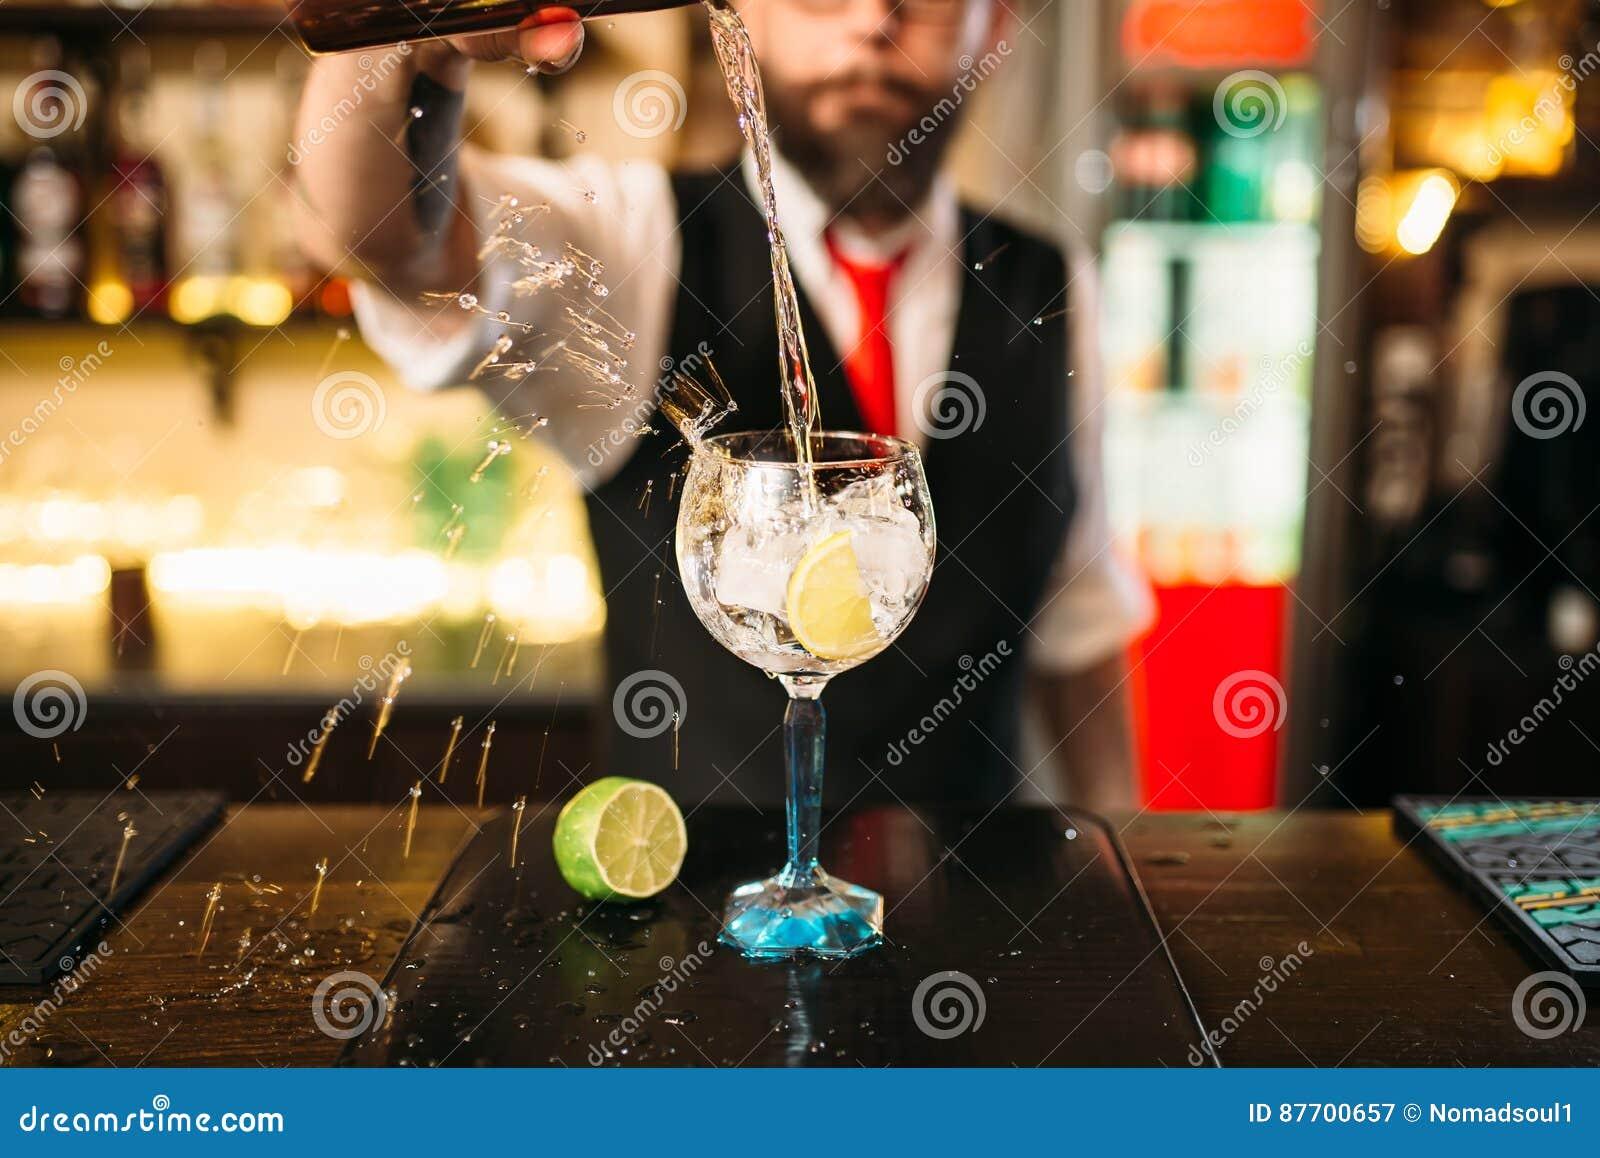 Barman versant la boisson alcoolisée en verre